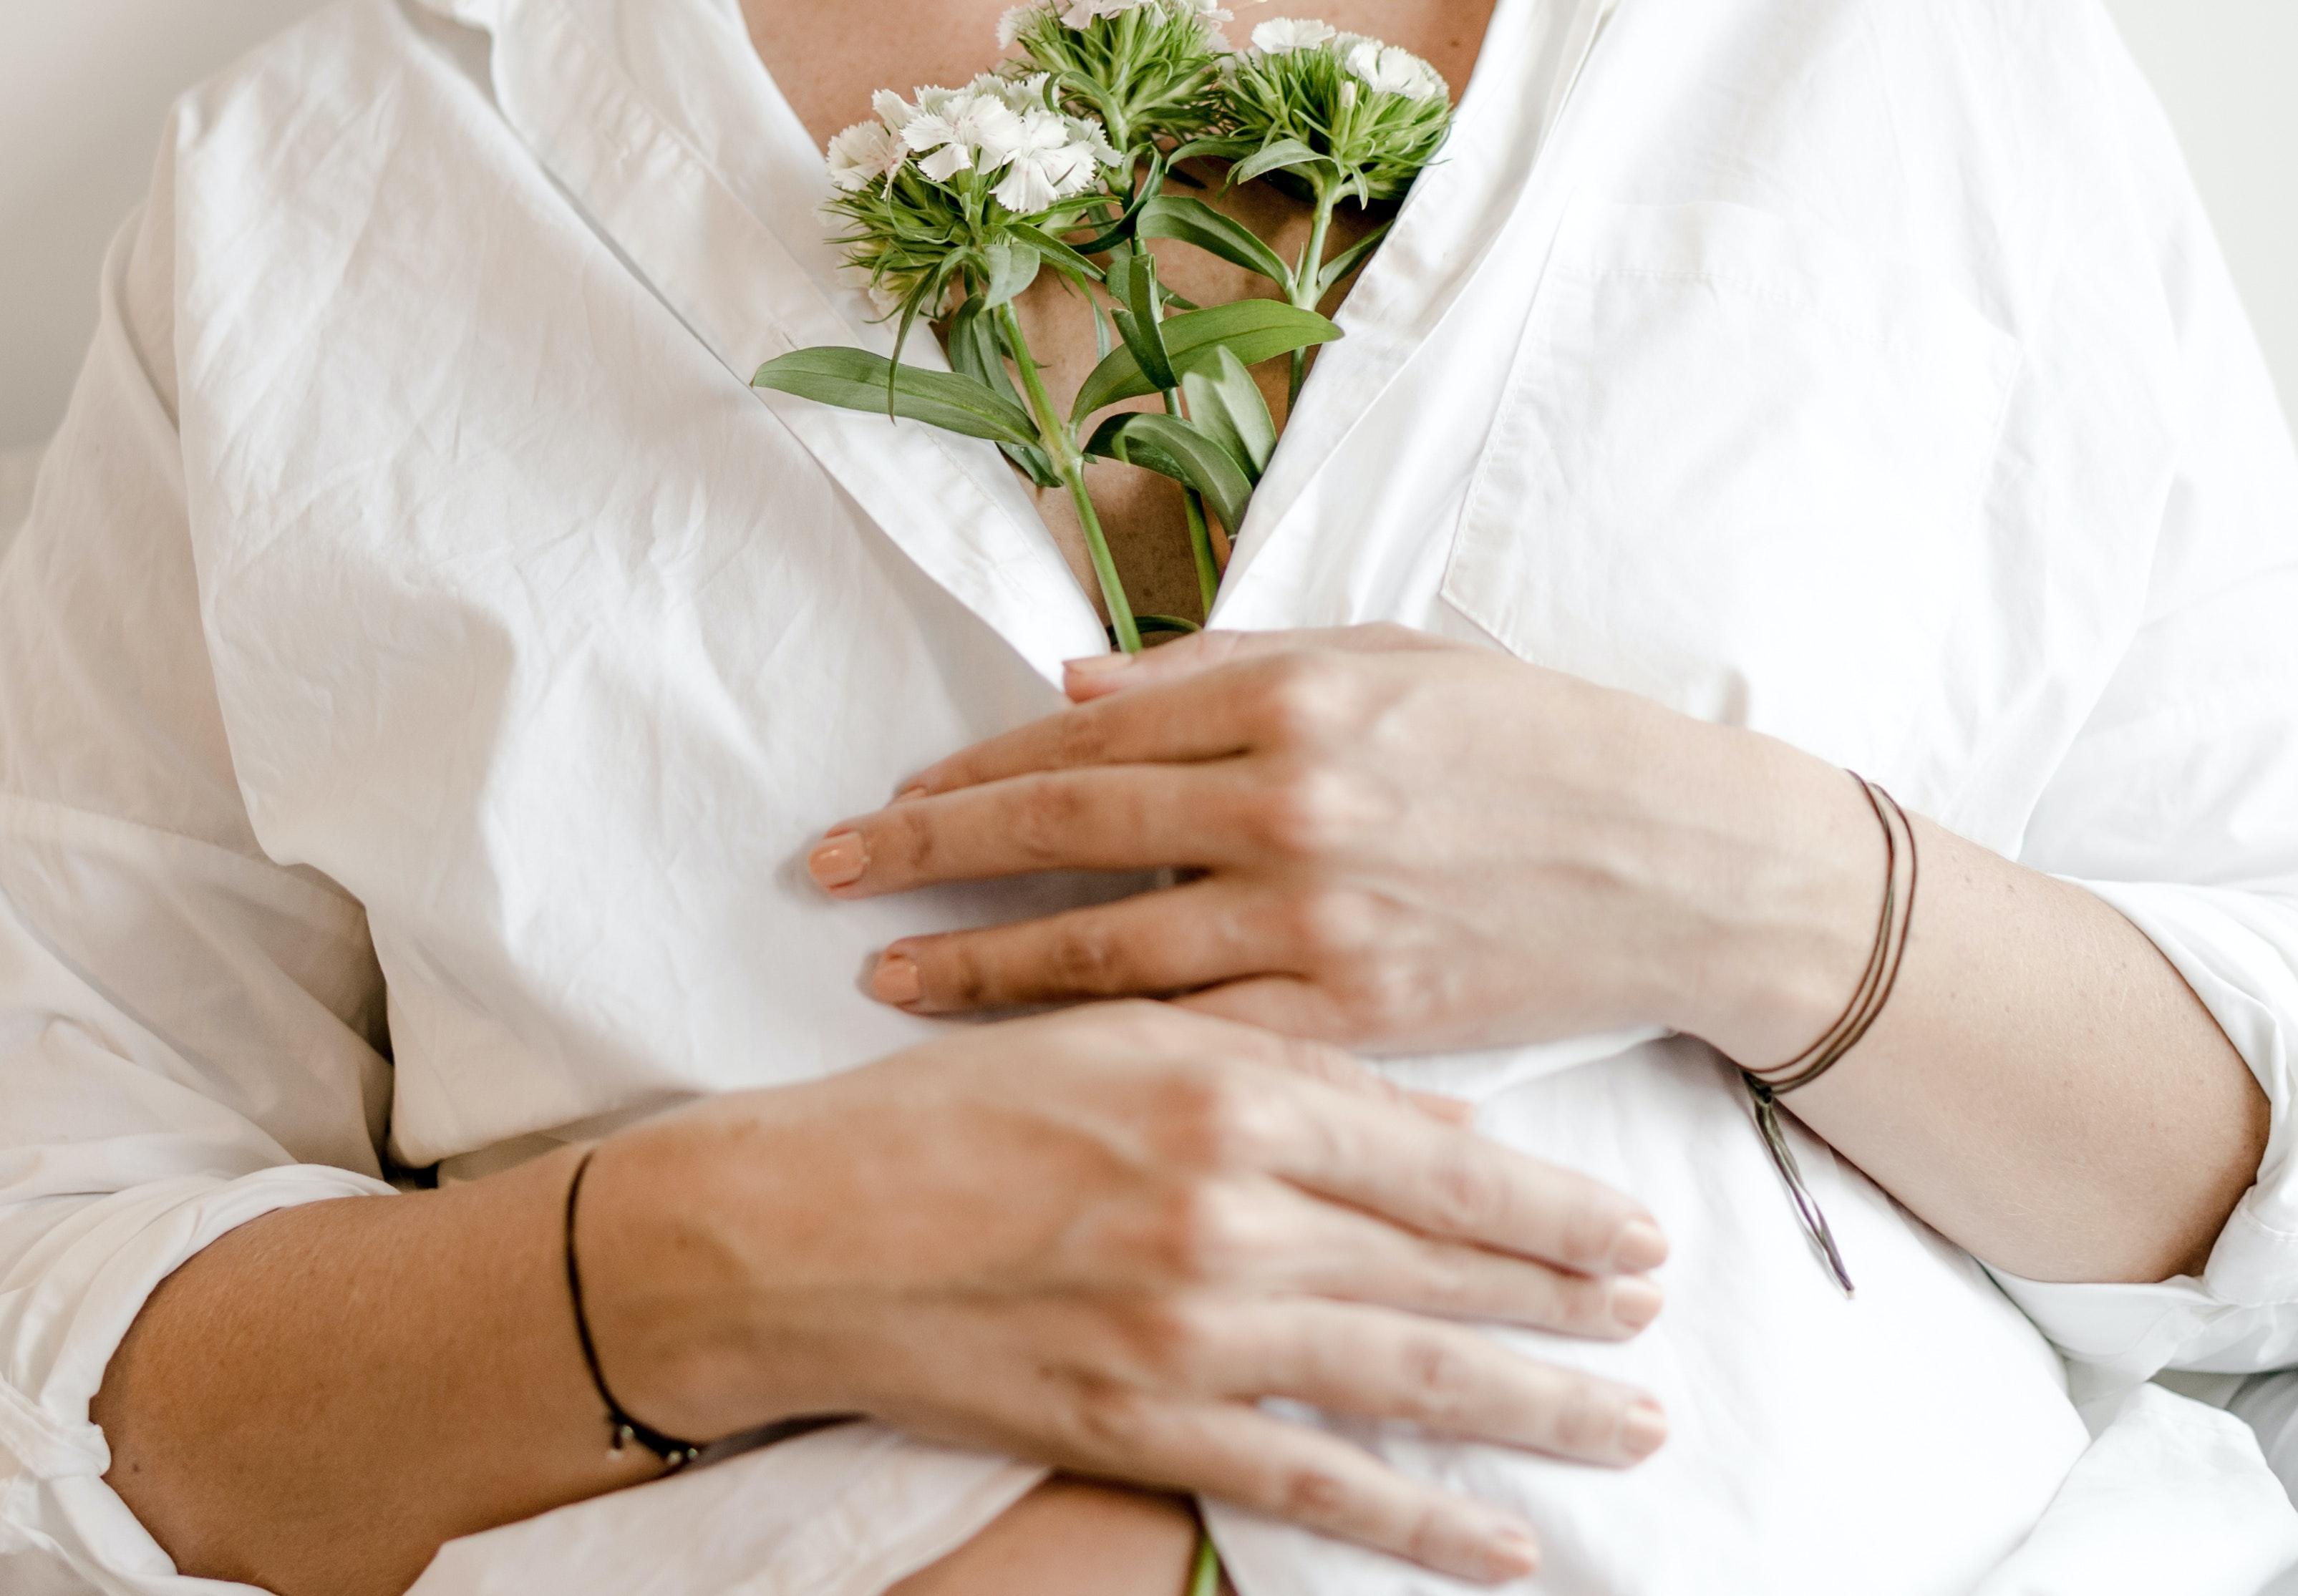 8 Common pregnancy complications